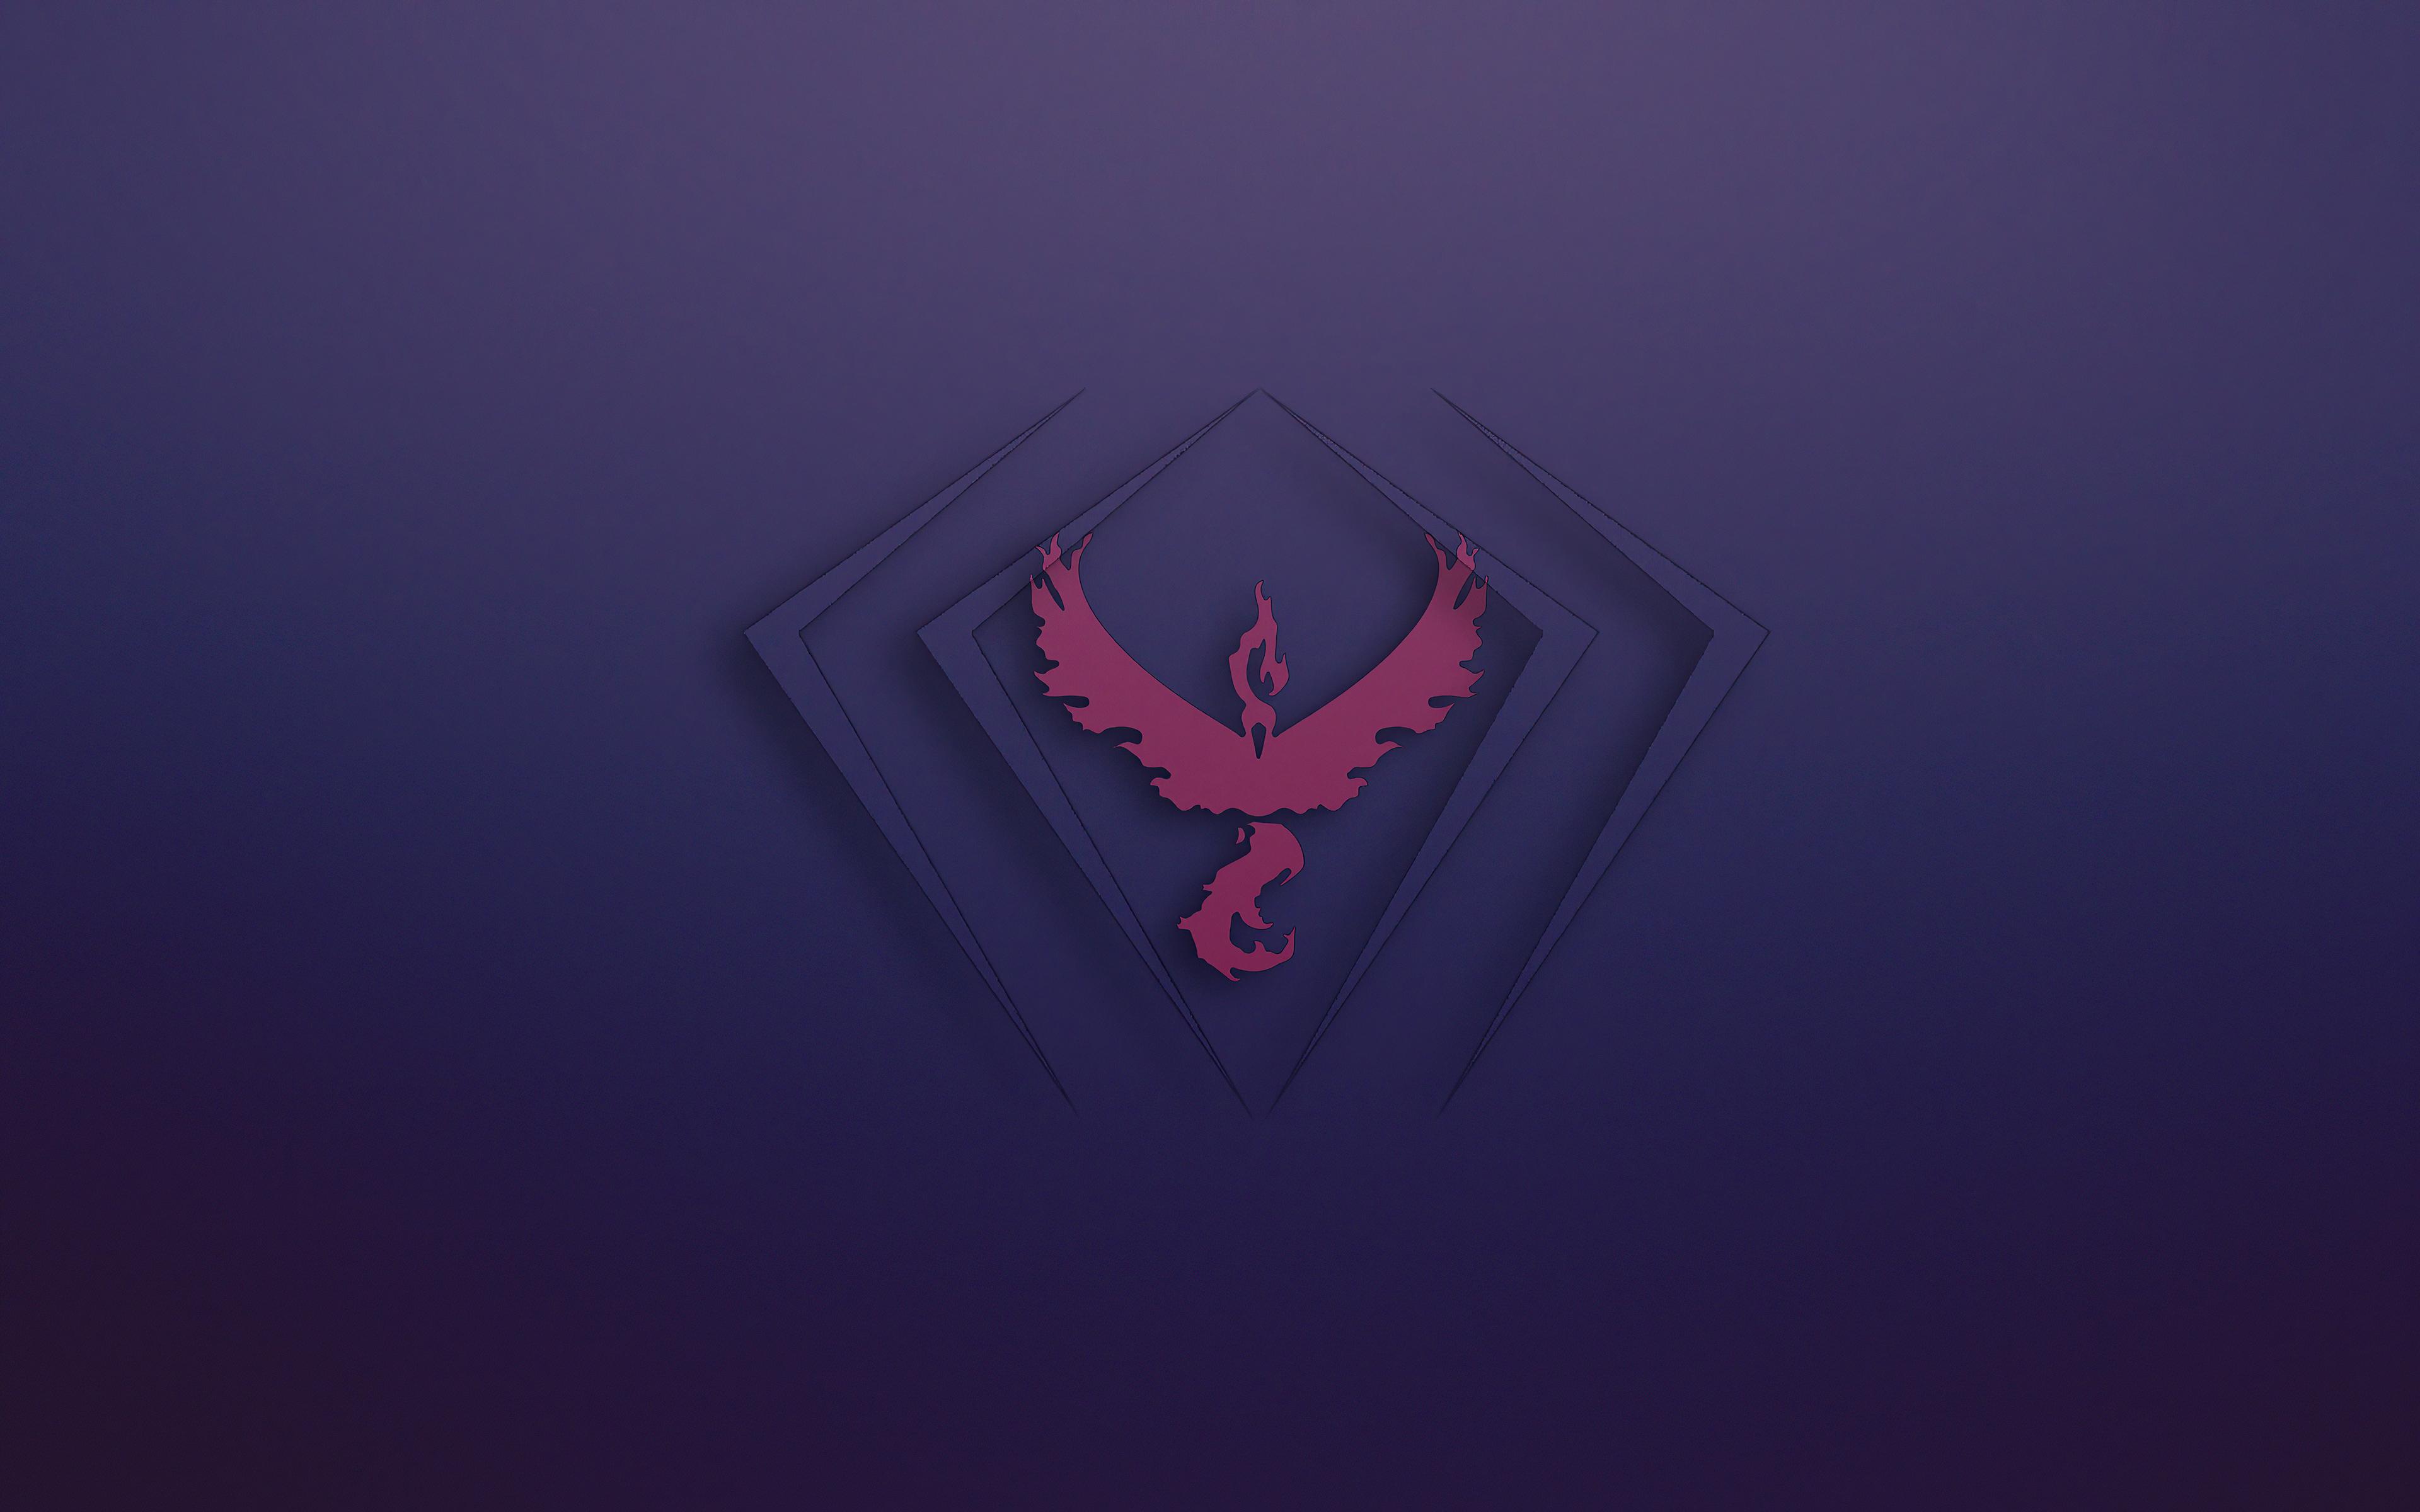 phoenix pokemon logo 4k 1604868040 - Phoenix Pokemon Logo 4k - Phoenix Pokemon Logo 4k wallpapers